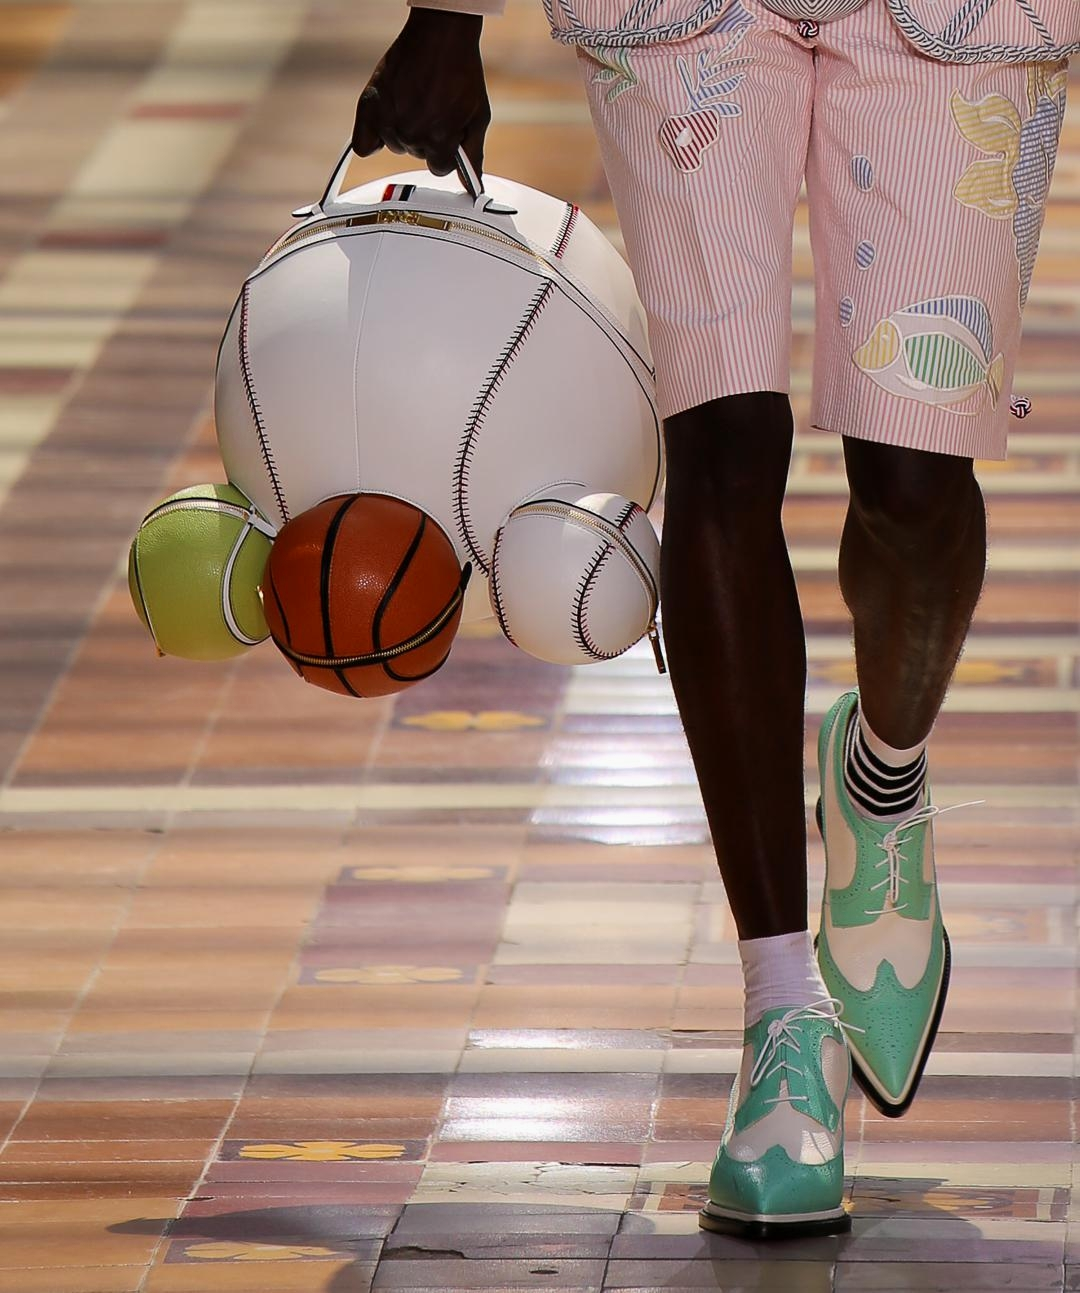 Сумка из коллекции Thom Browne Spring/Summer 2020 Menswear